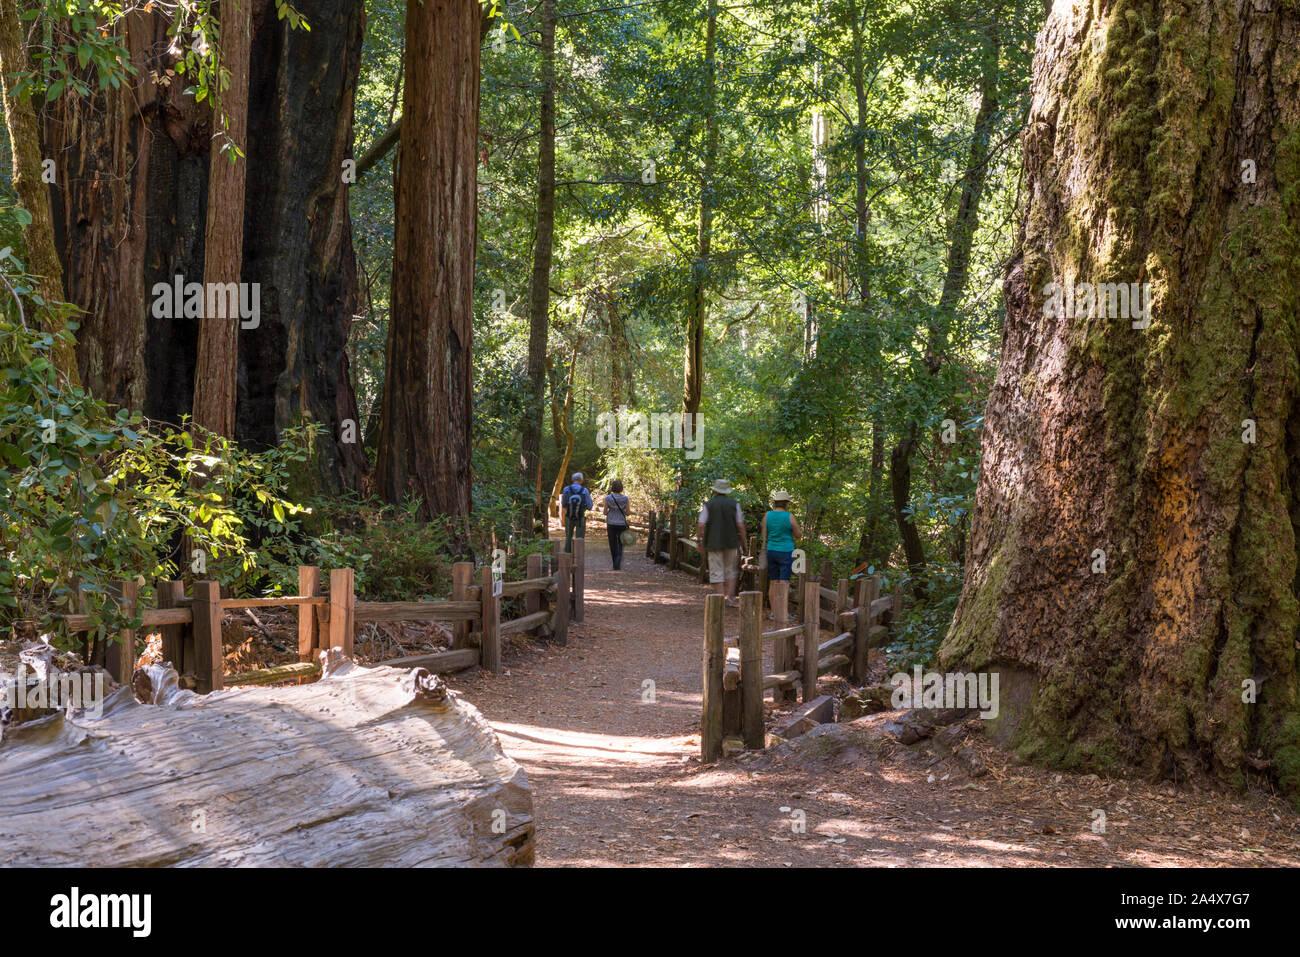 Big Basin Redwoods State Park. Santa Cruz county, California. Stock Photo